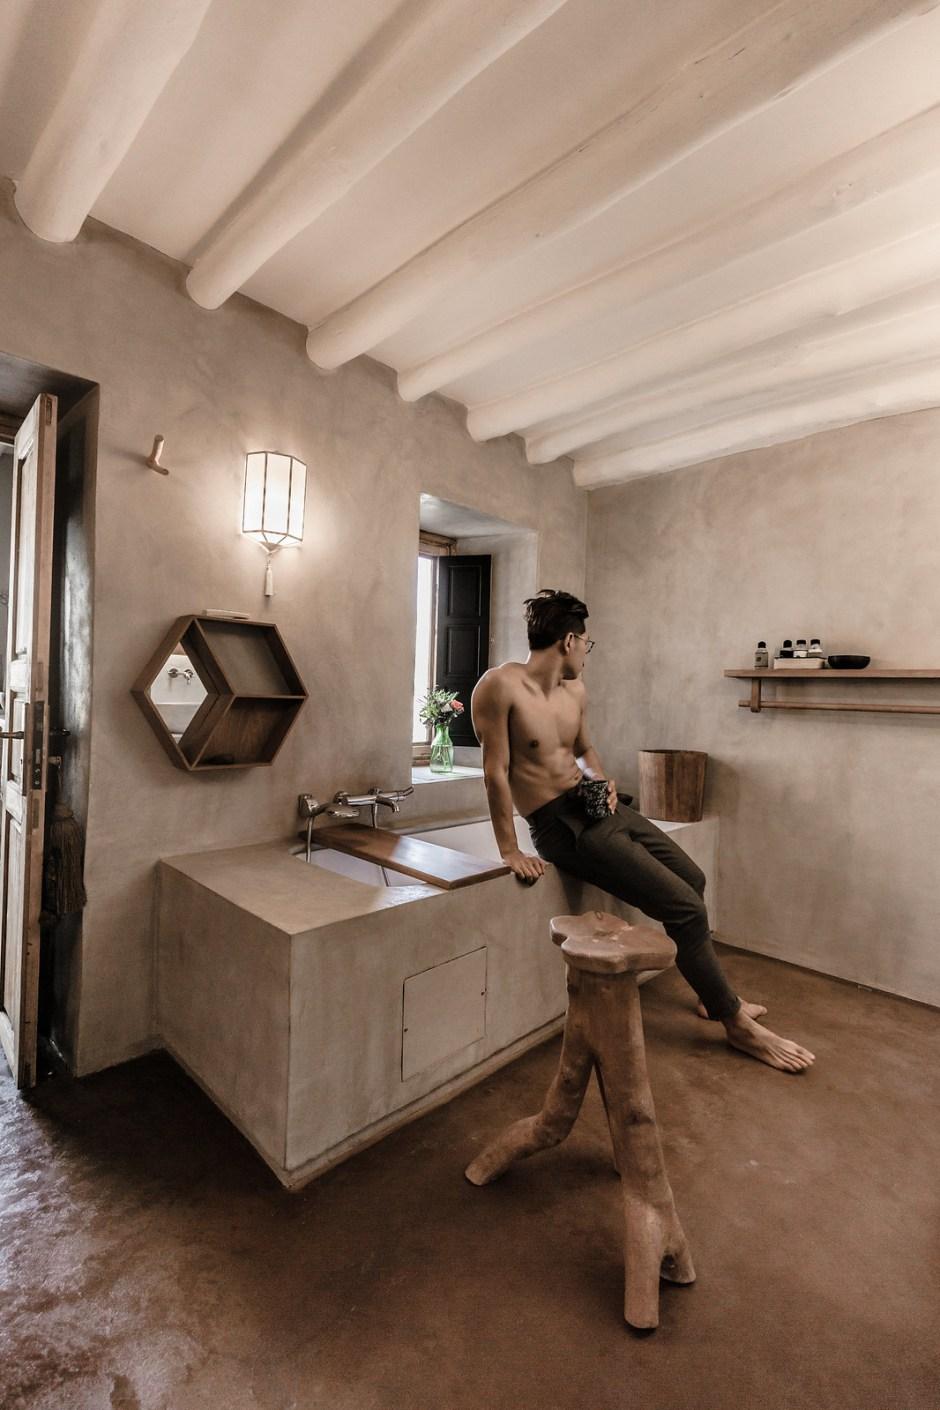 The dog suite bath-tub